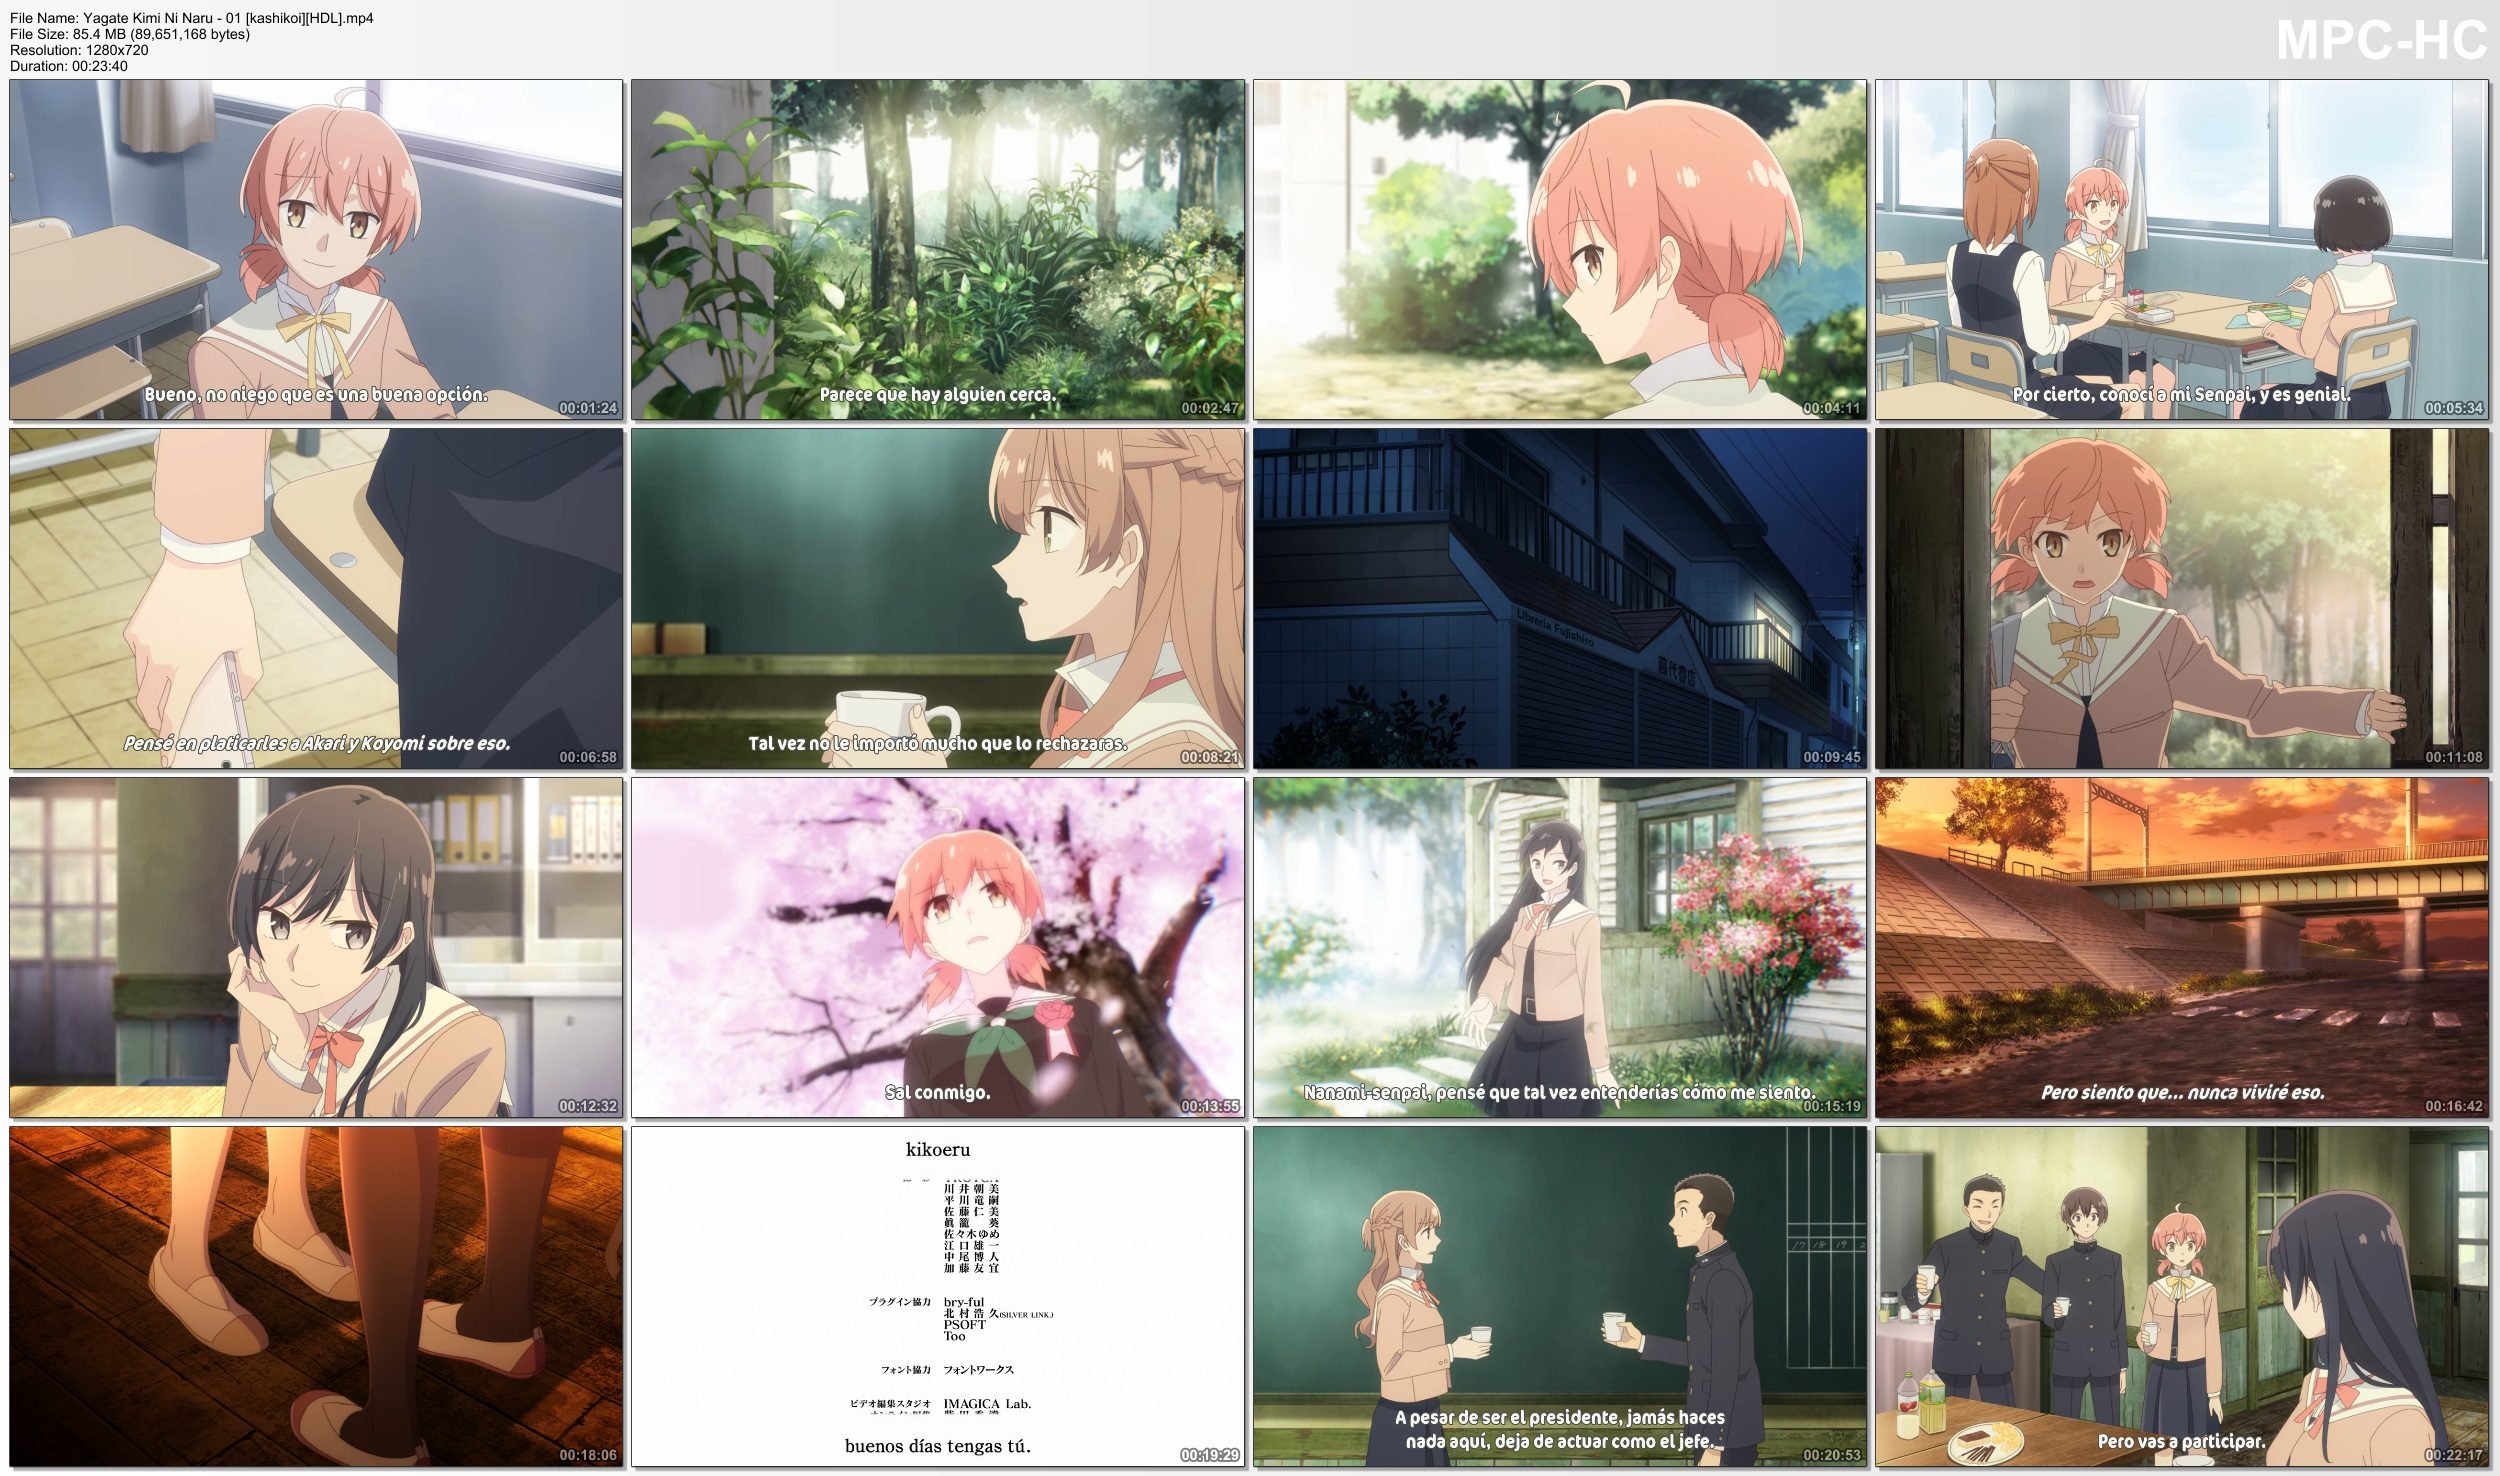 3MZgXMWgzG3ae - [Aporte] Yagate Kimi ni Naru [13/13][85MB][PCNet, Kashikoi][MEGA][Concluido] - Anime Ligero [Descargas]